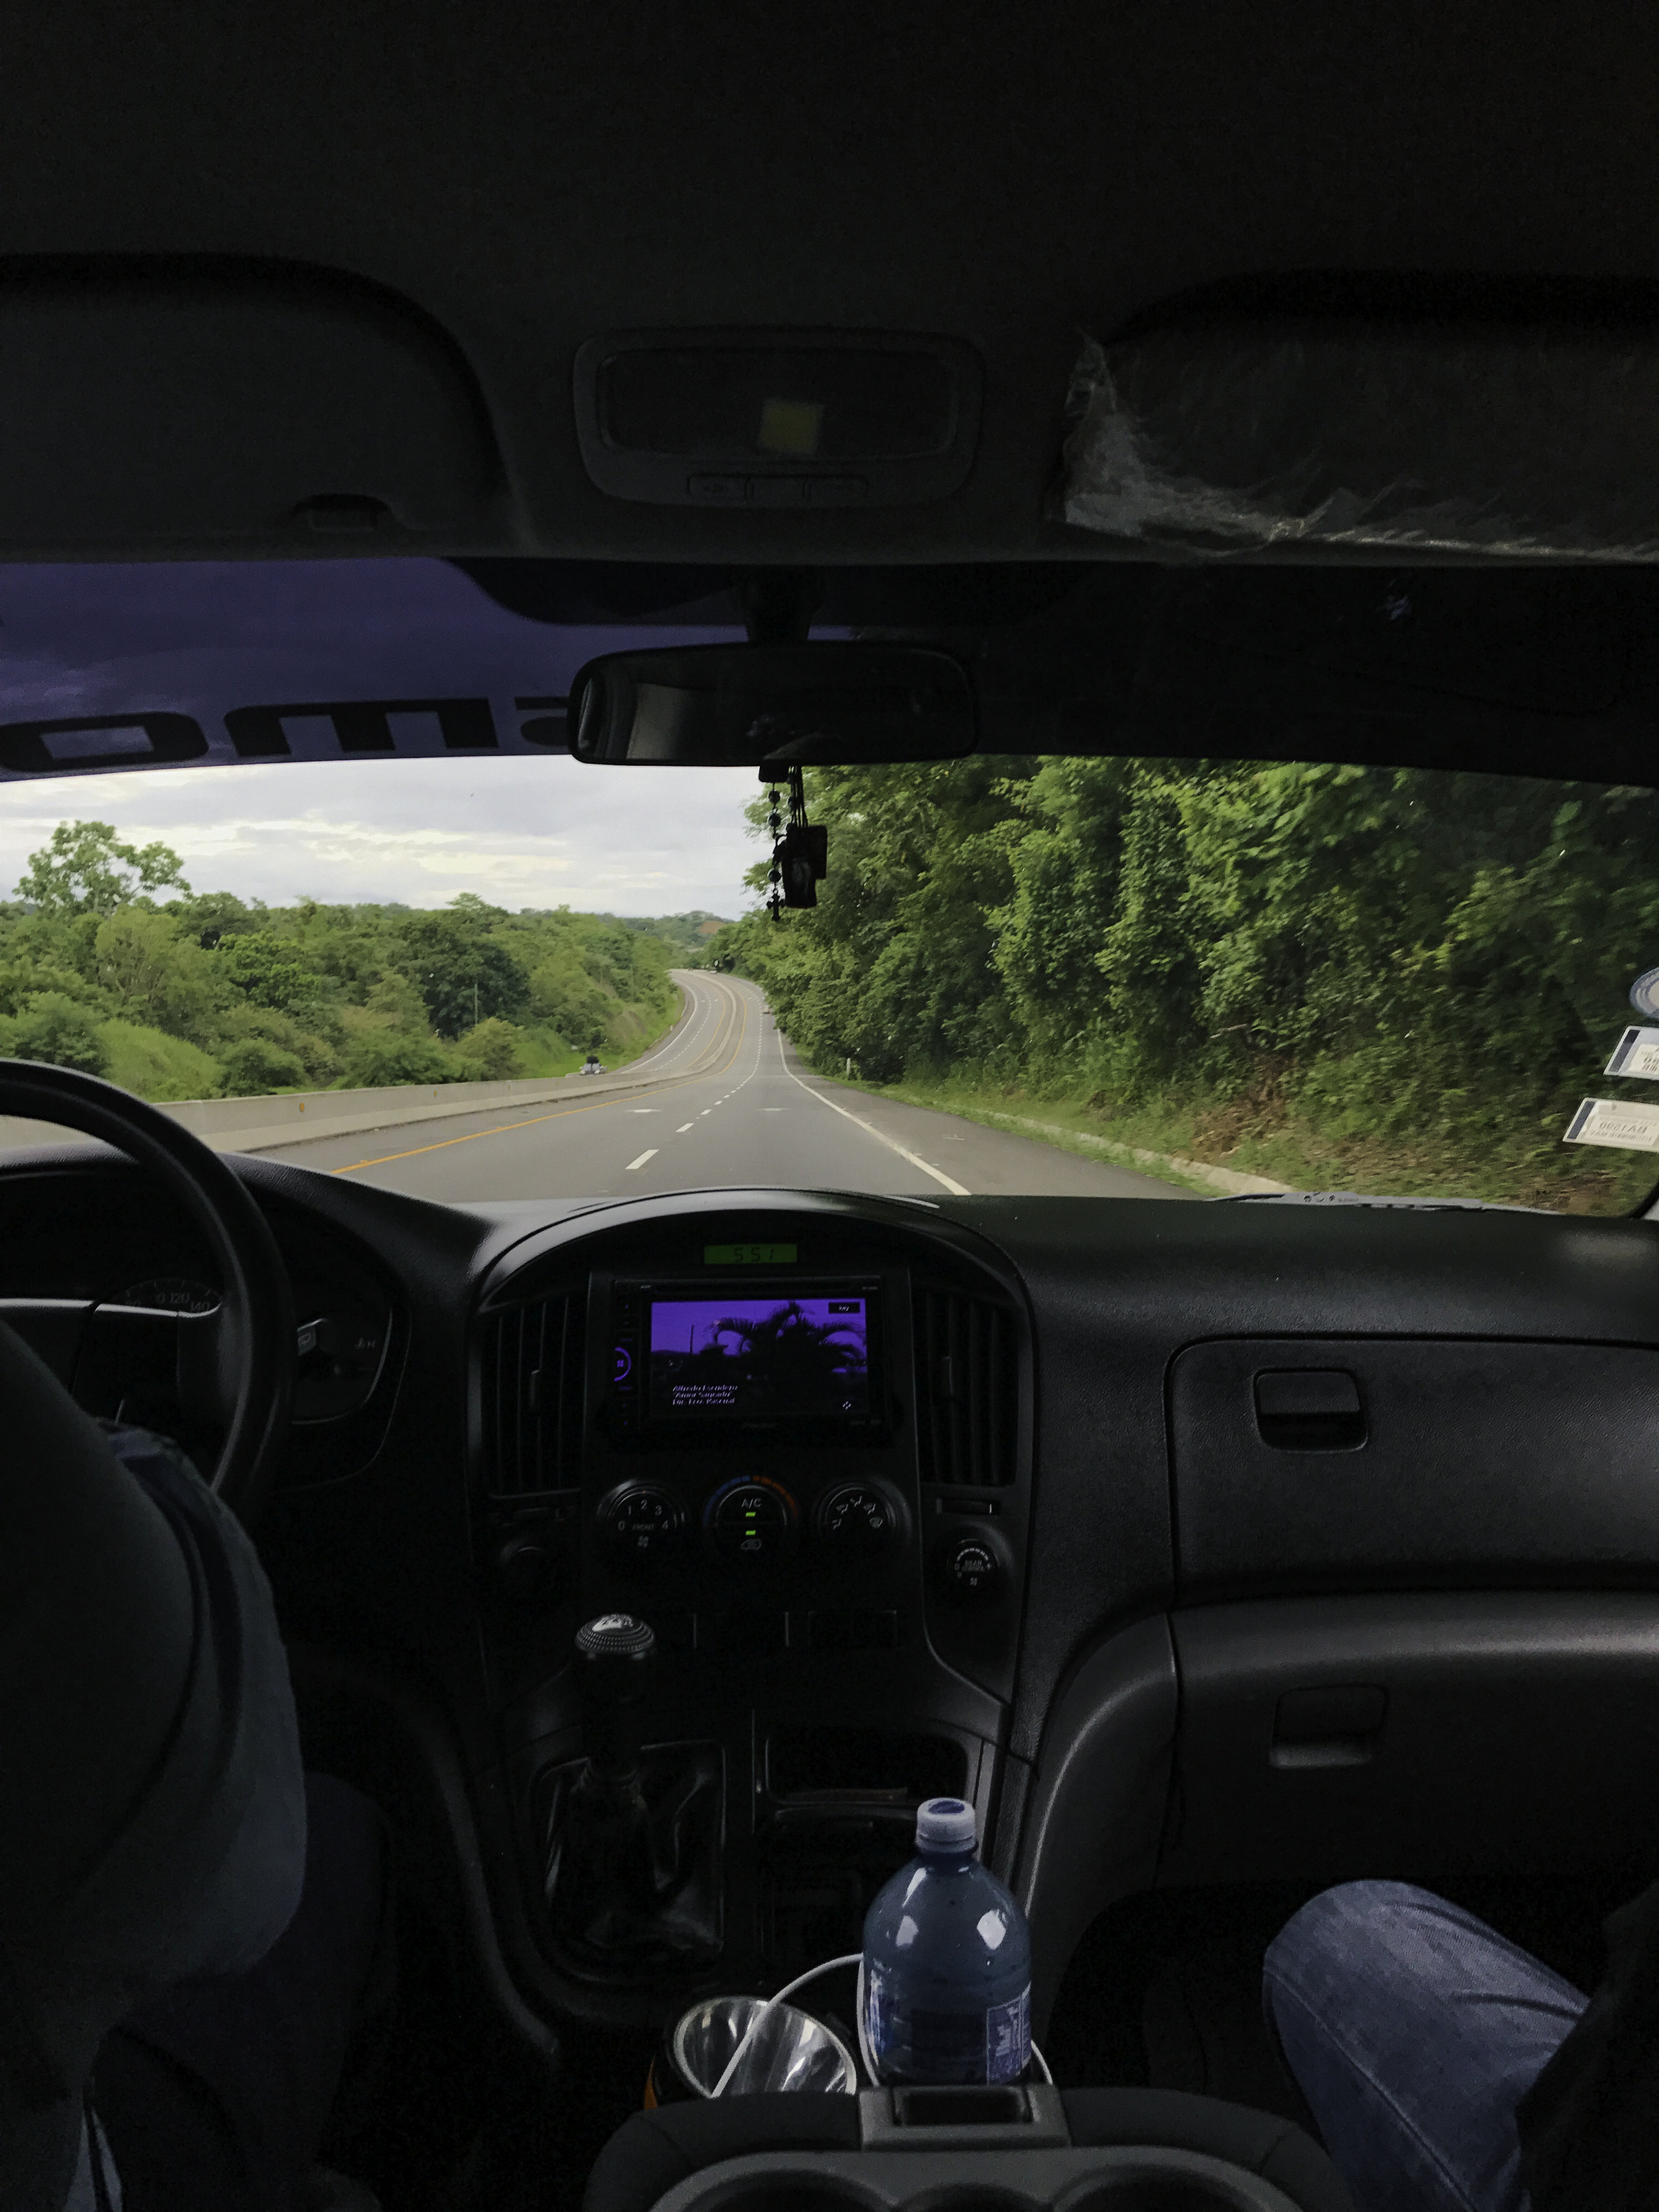 Ride from David Panama to Boca Chica